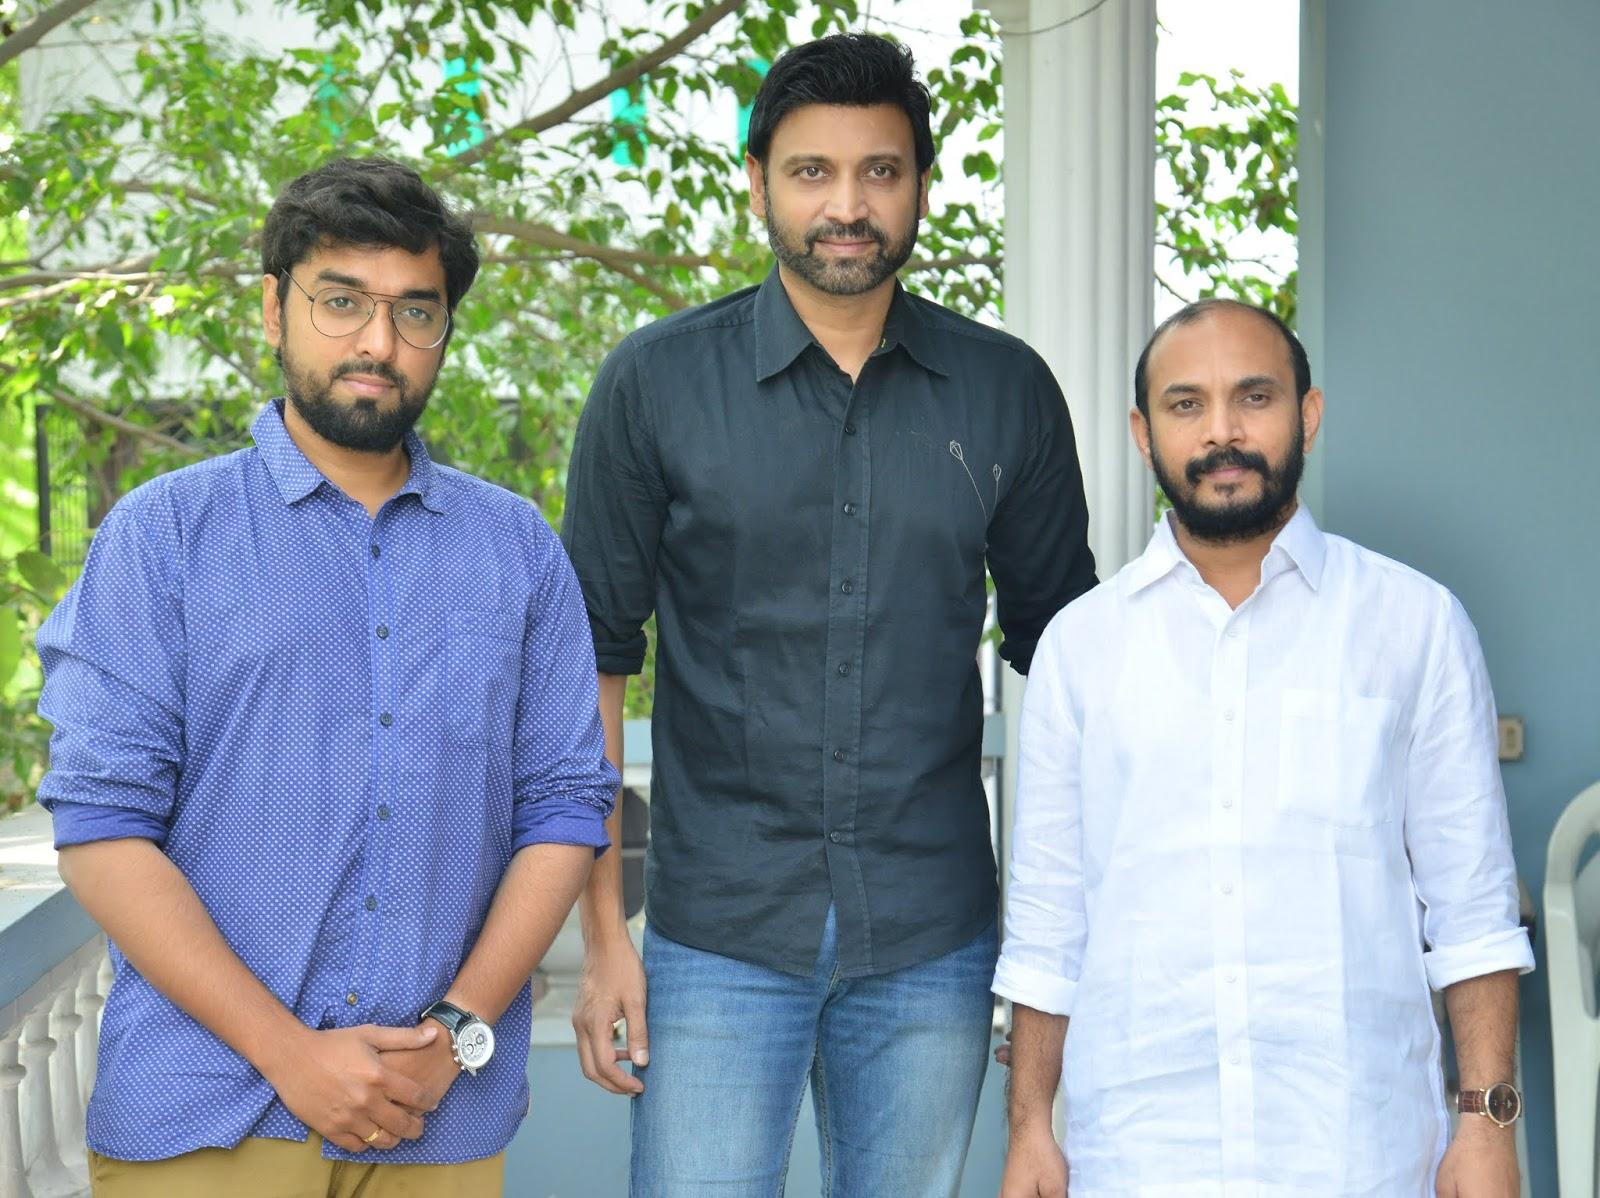 Santhosh Jagarlapudi, Sumanth, Beeram Sudhakar Reddy @ Subramaniapuram Telugu Movie Press Meet Stills